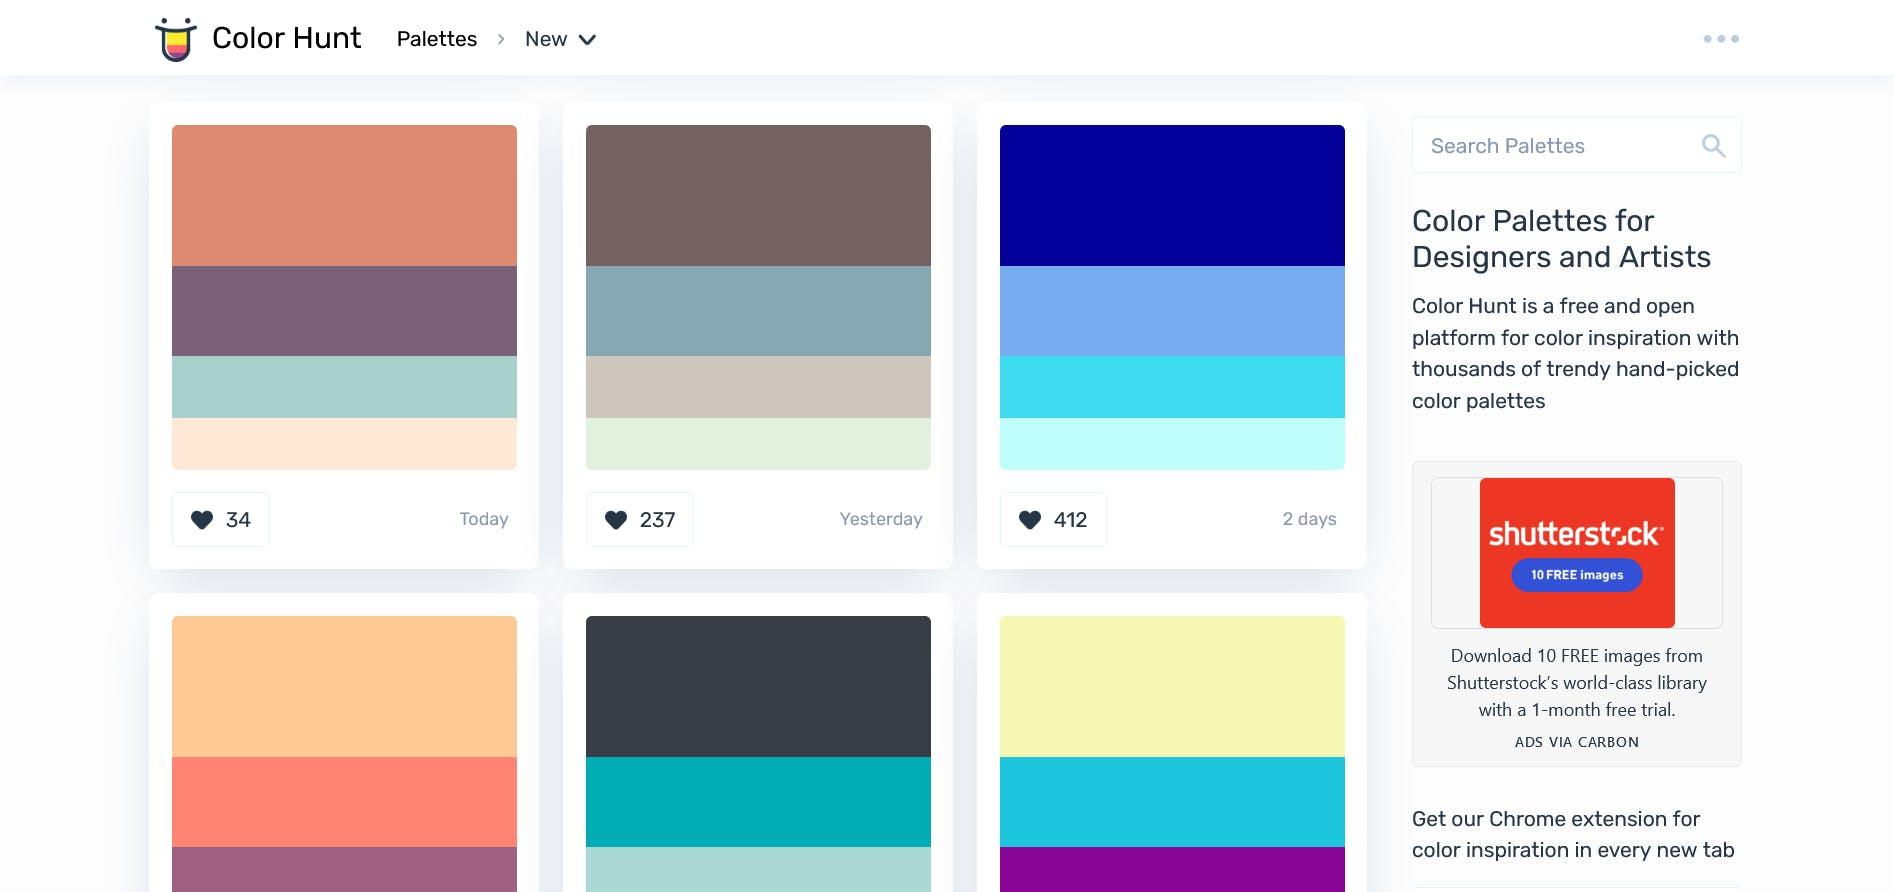 Screenshot 2021-04-30 at 08-16-09 Color Hunt - Color Palettes for Designers and Artists.png